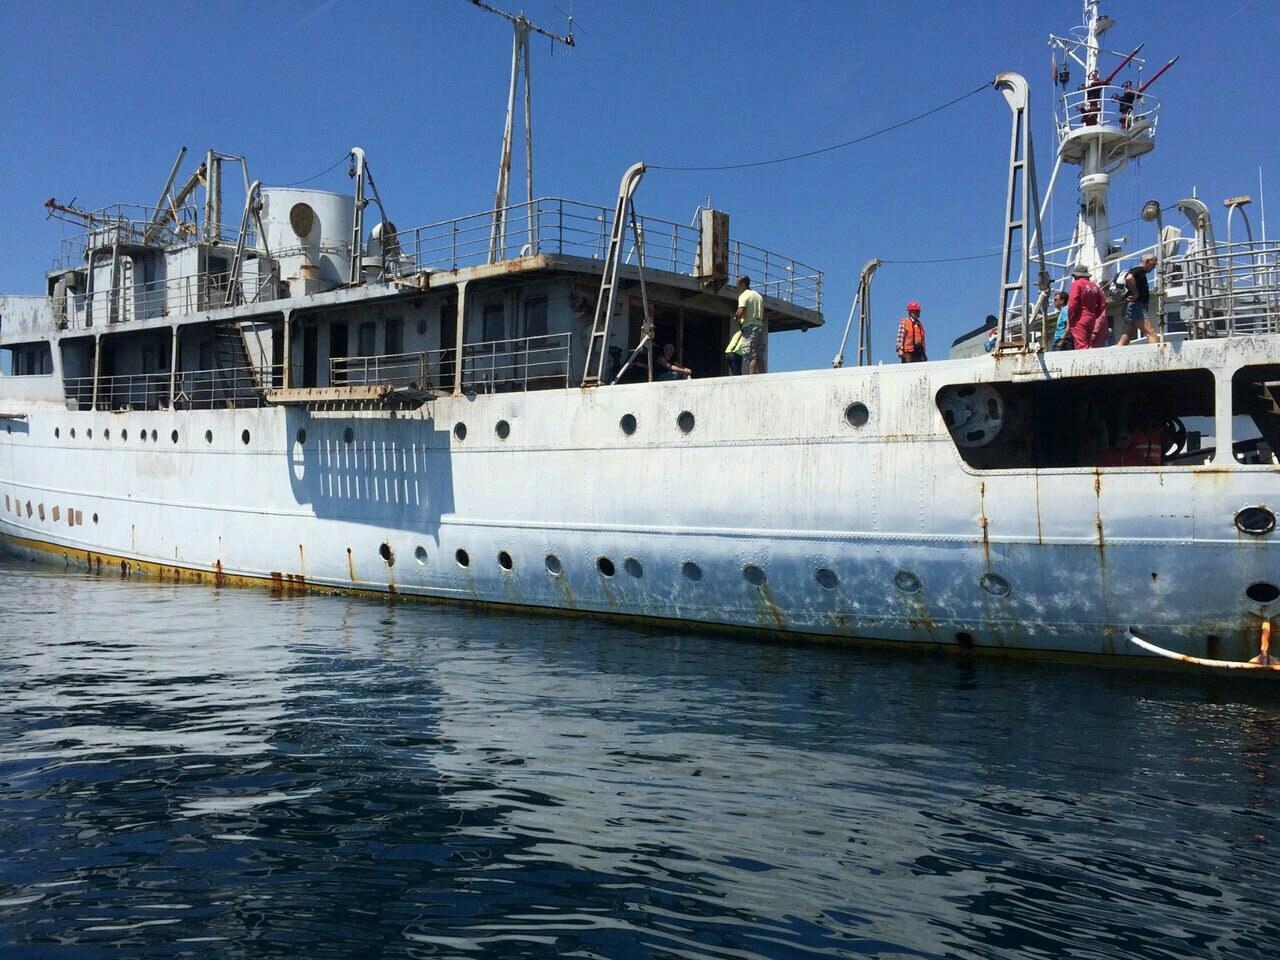 Brod Vis kao ronilačka atrakcija